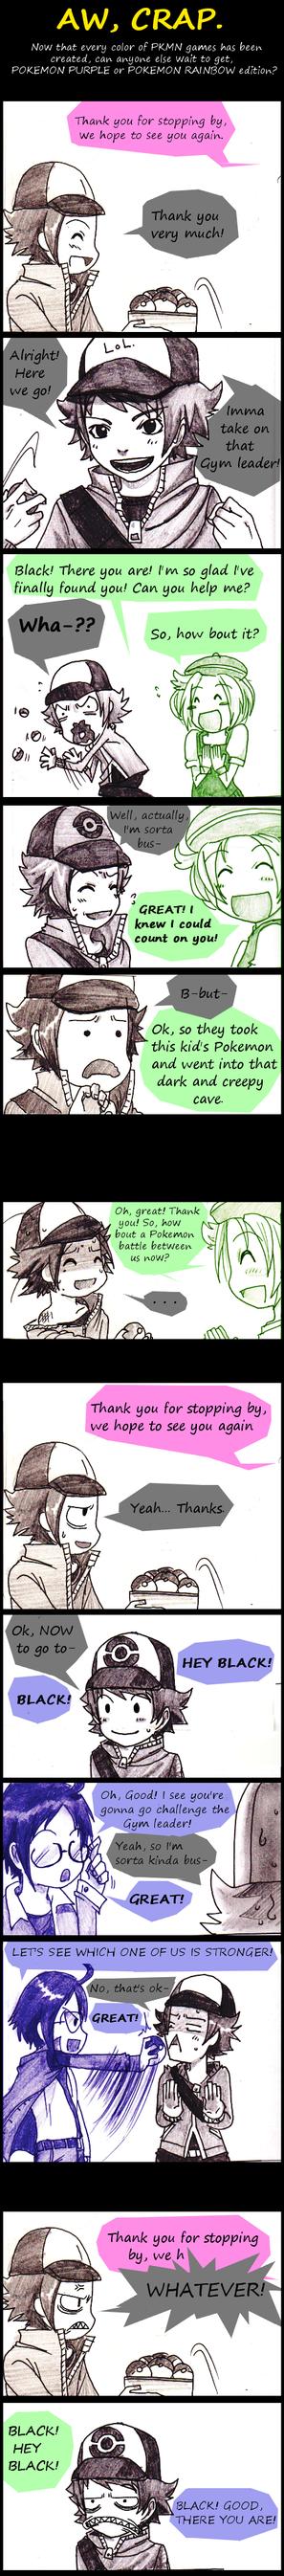 PKMN: Aw, Crap by AmukaUroy